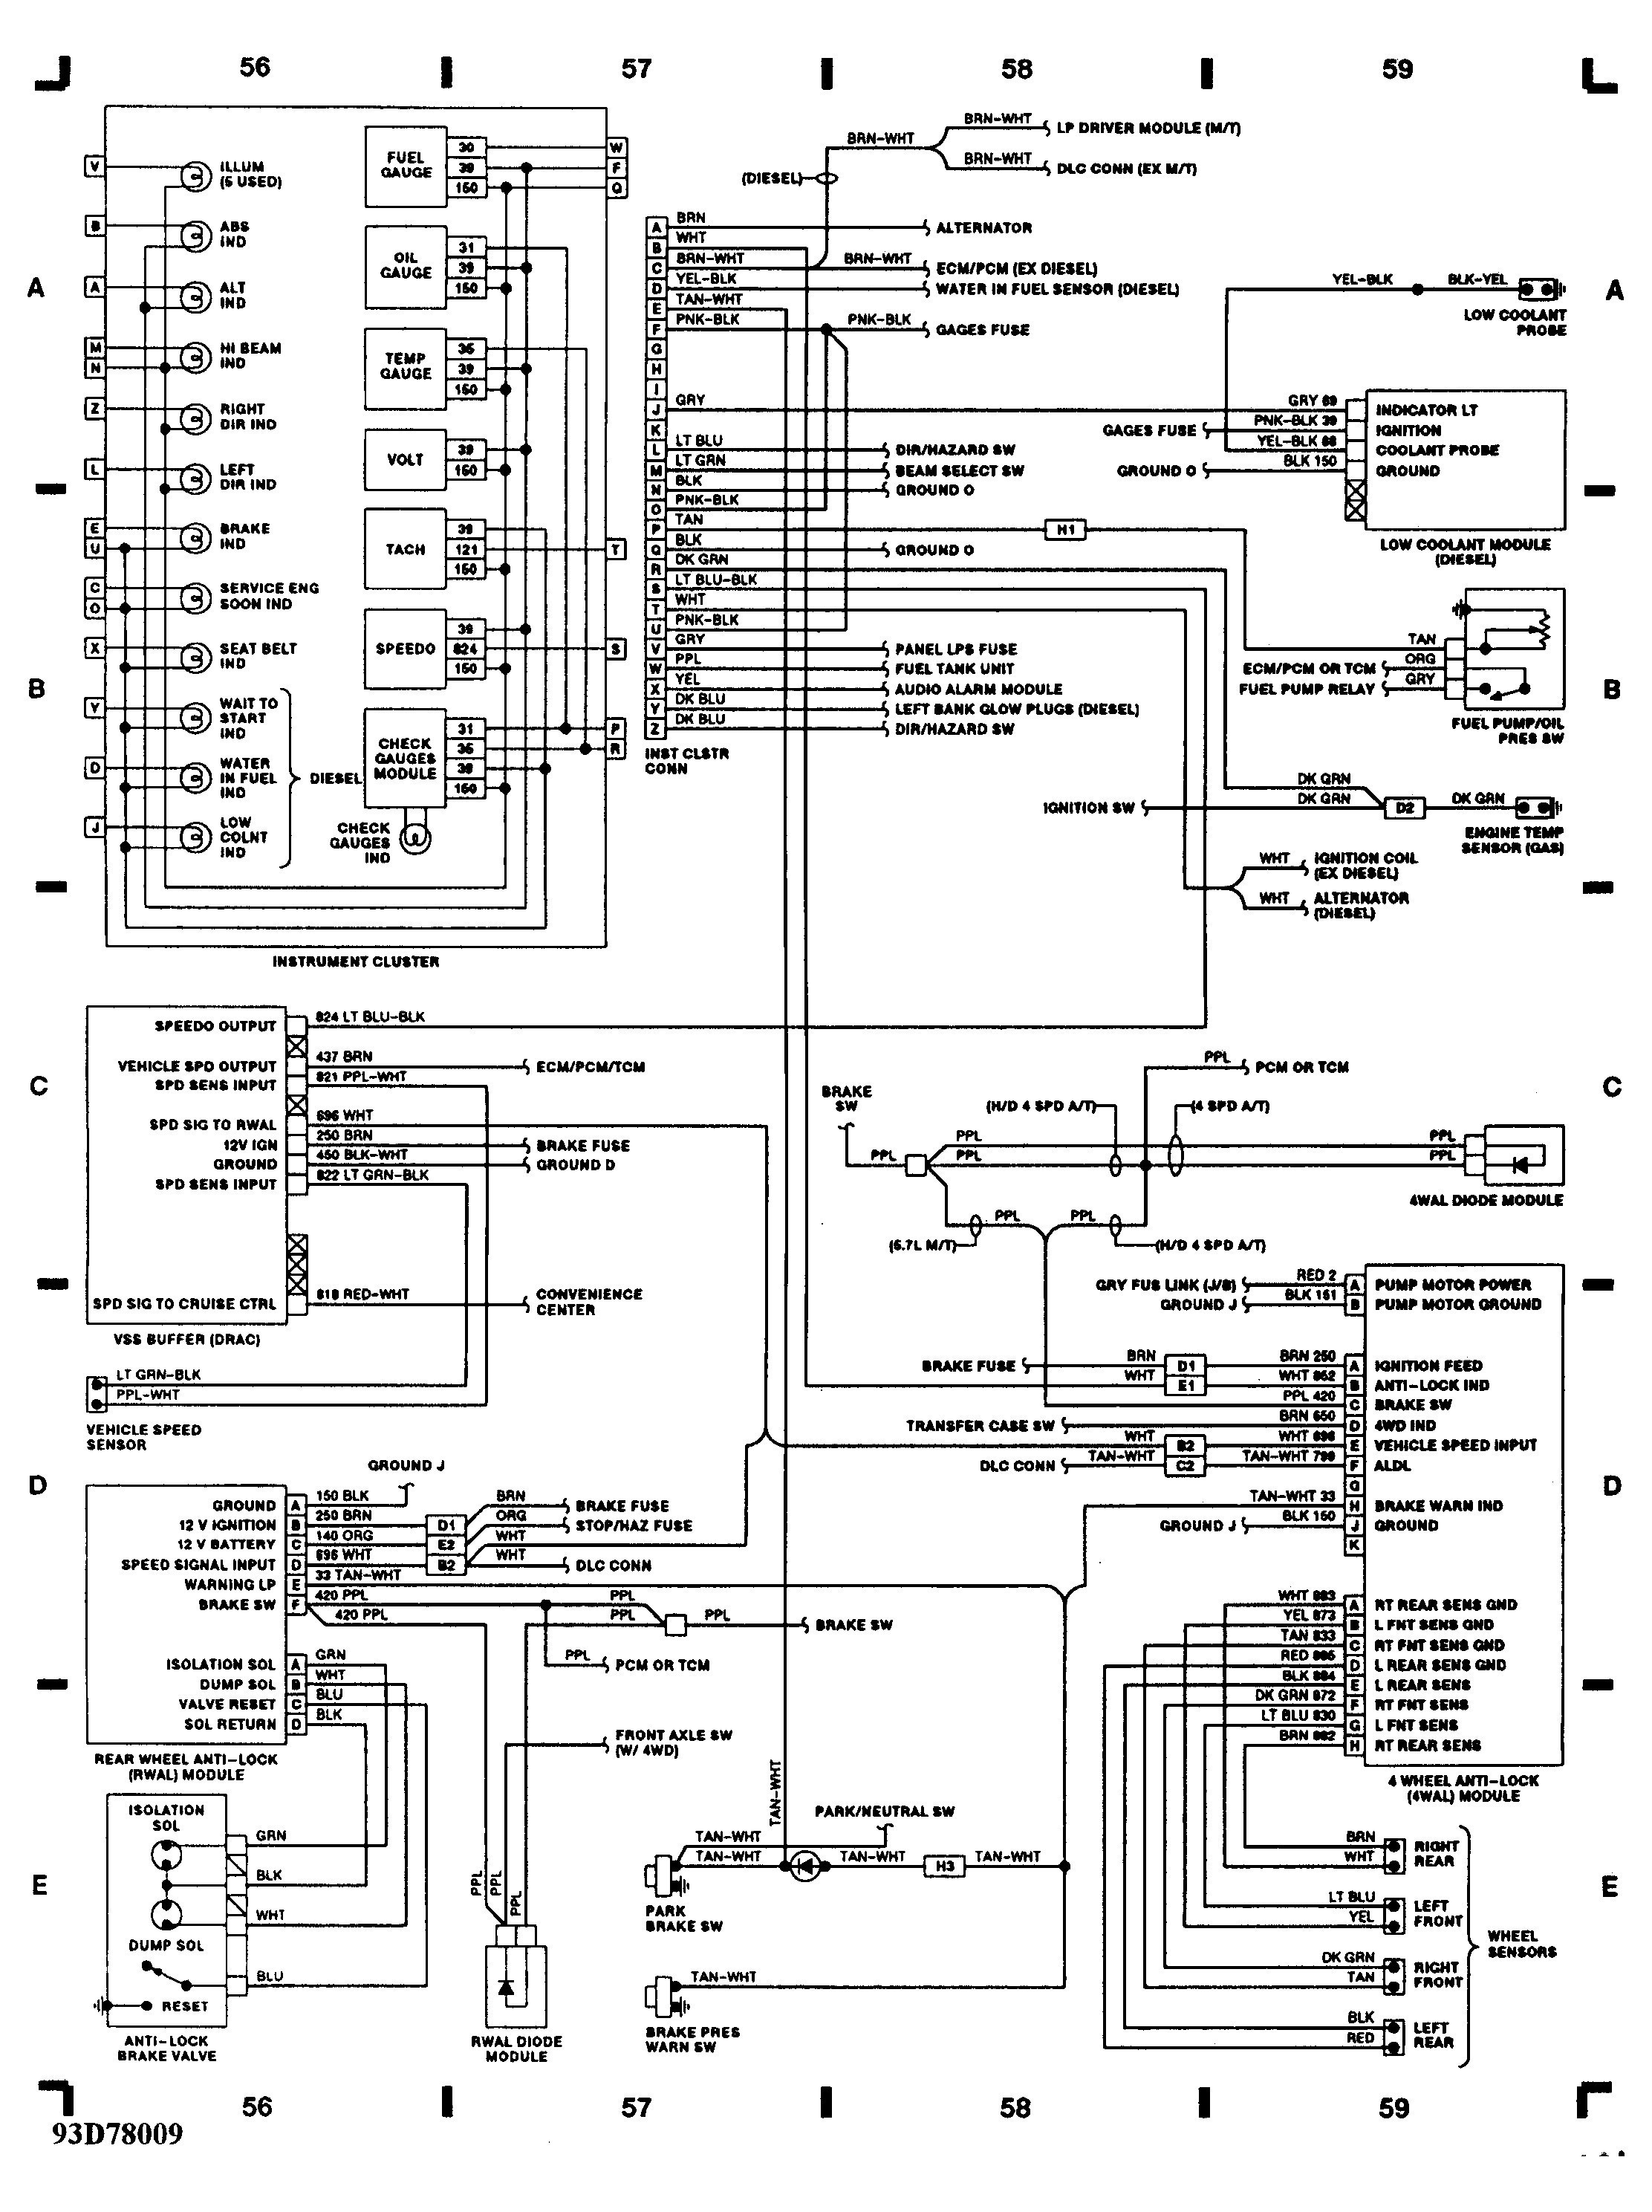 1993 chevy silverado wiring diagram my wiring diagram 1993 chevy c1500 radio wiring diagram 1993 chevy silverado radio wiring diagram